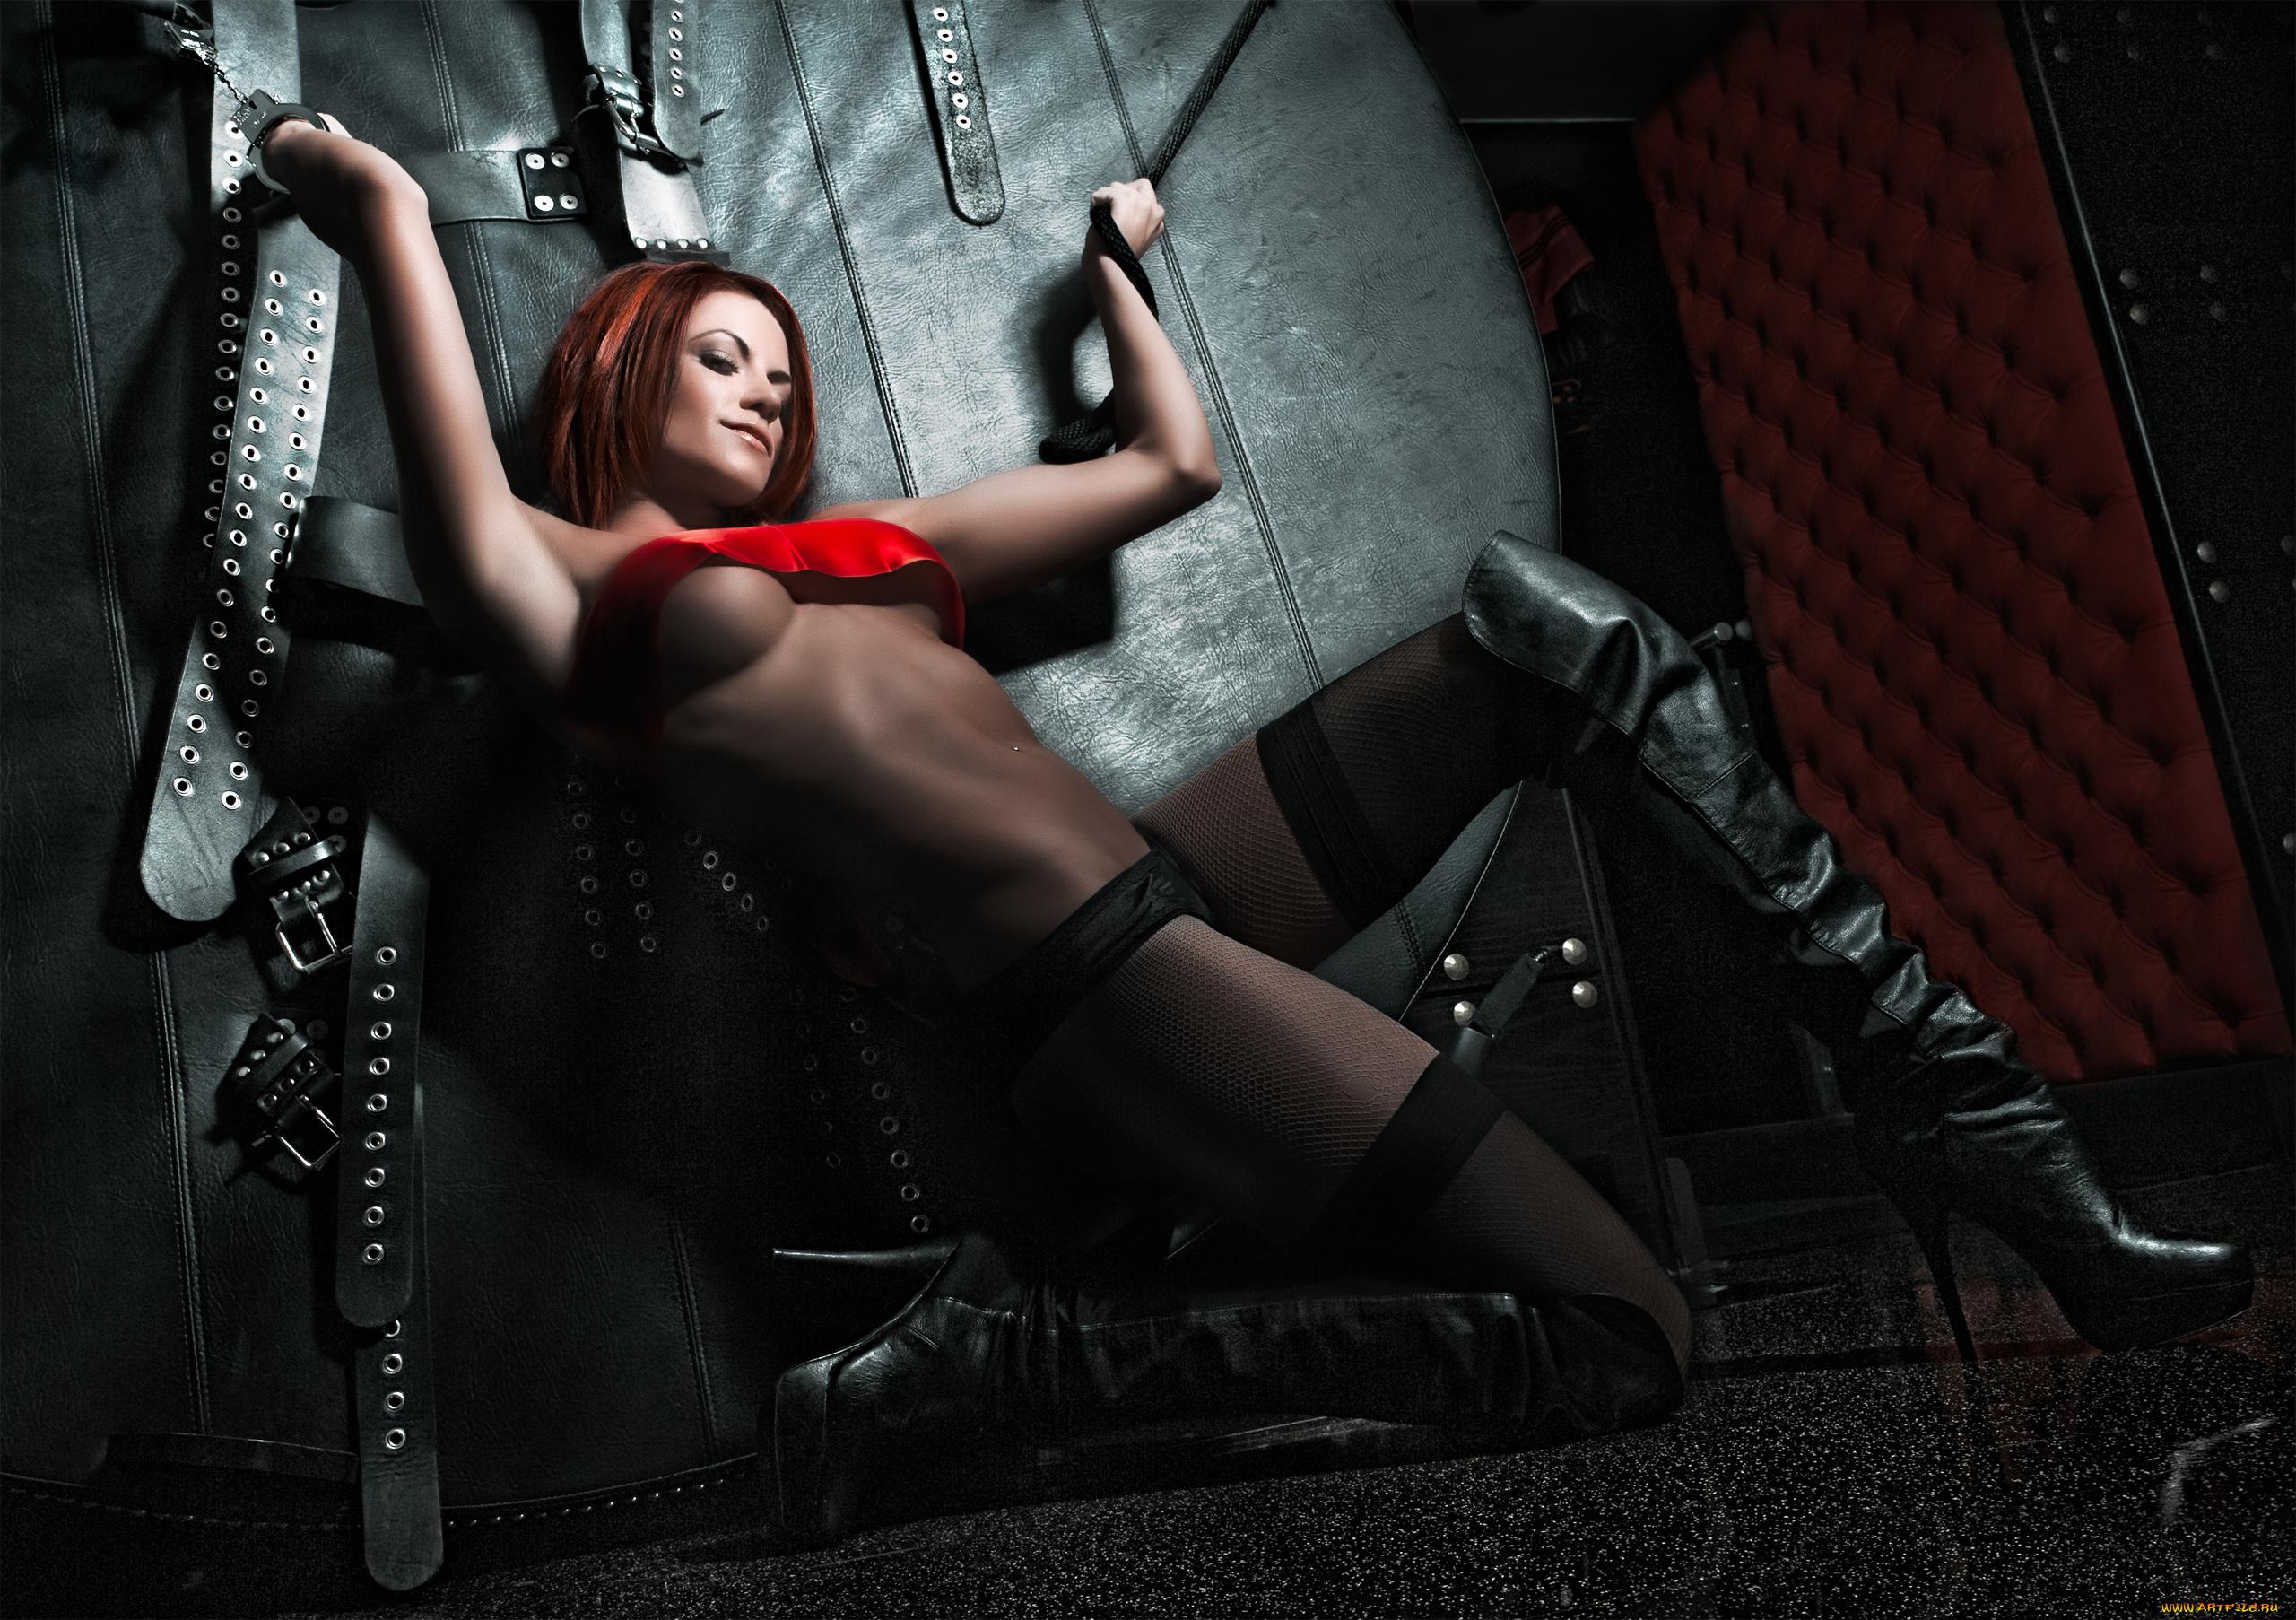 bdsm-uzhasniy-porno